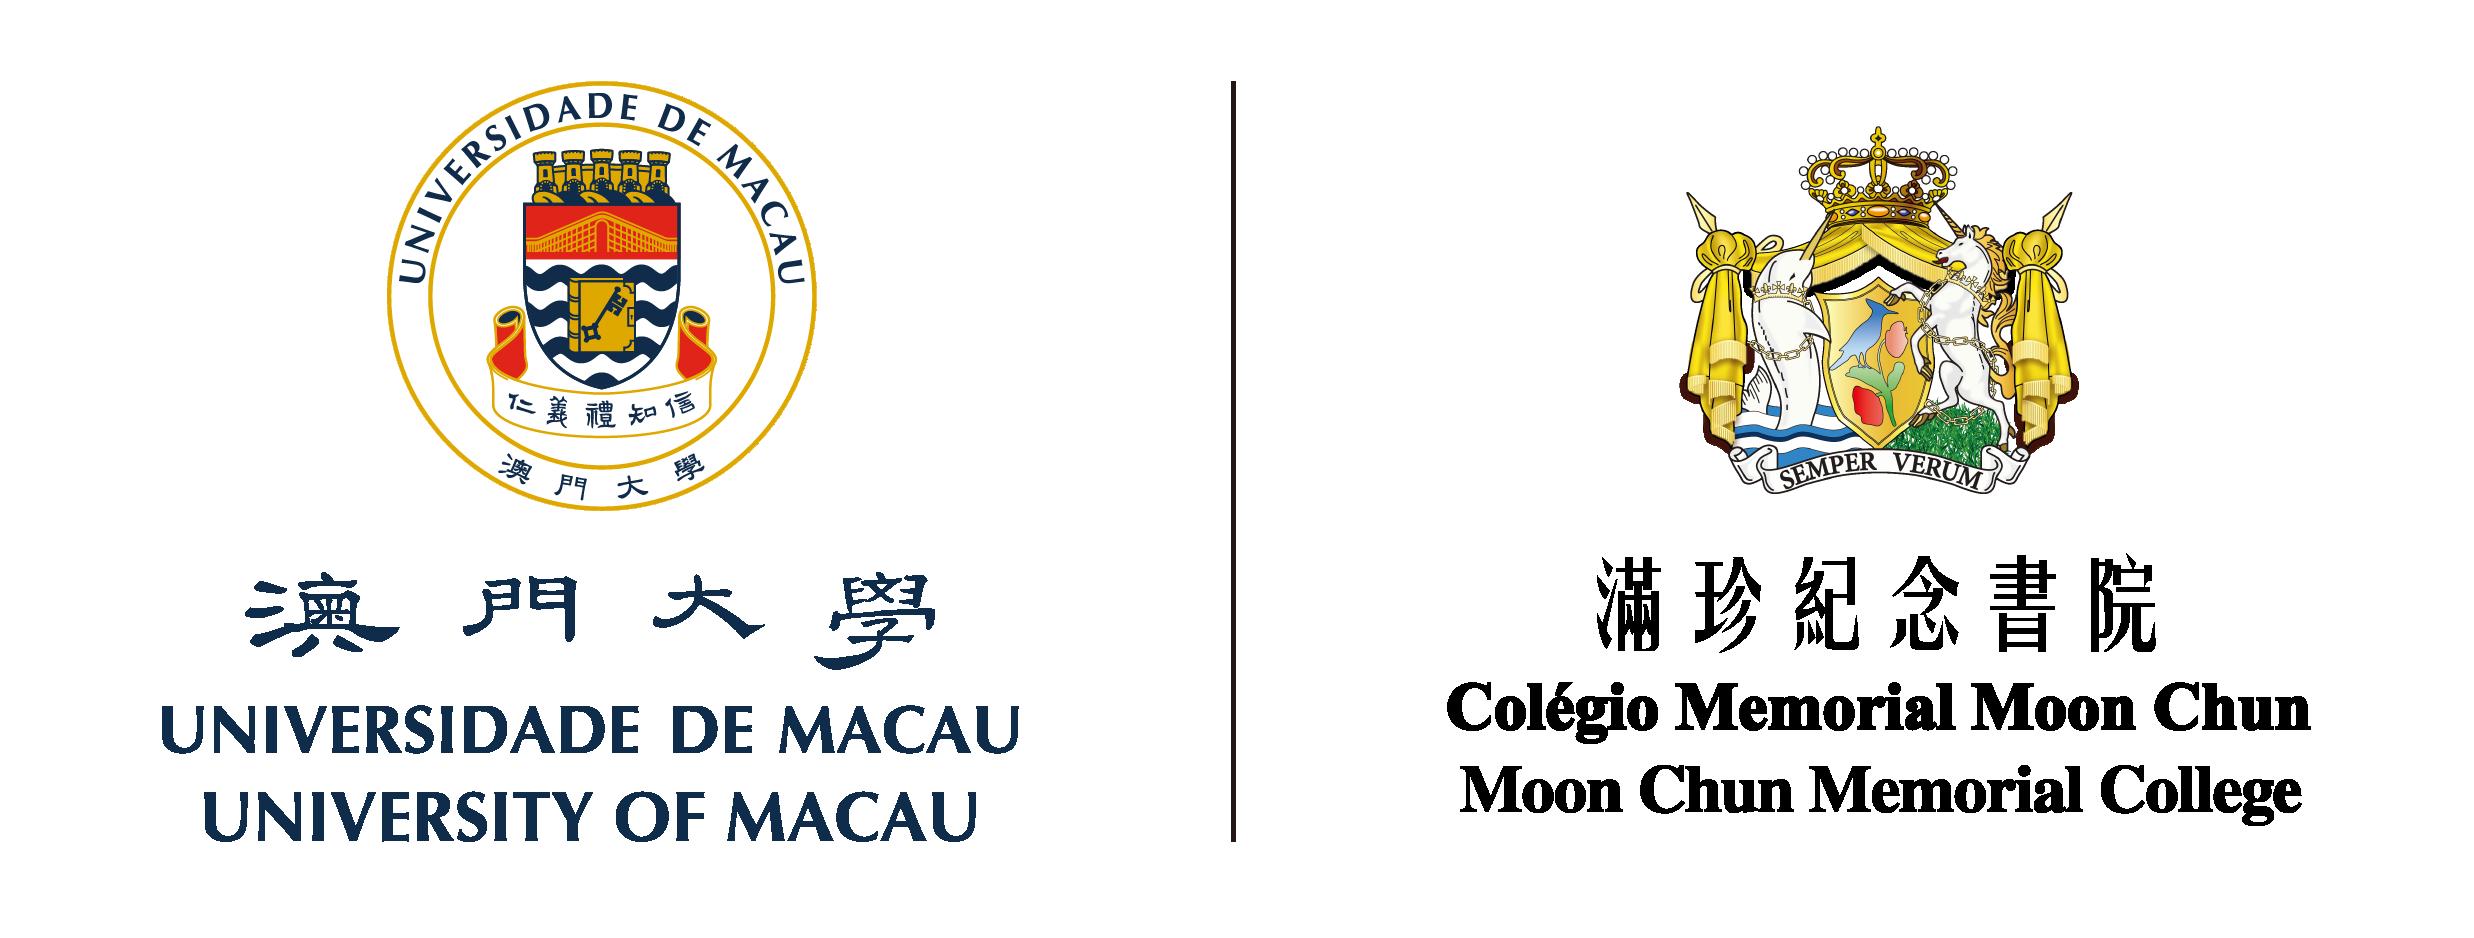 Moon Chun Memorial College | University of Macau Logo